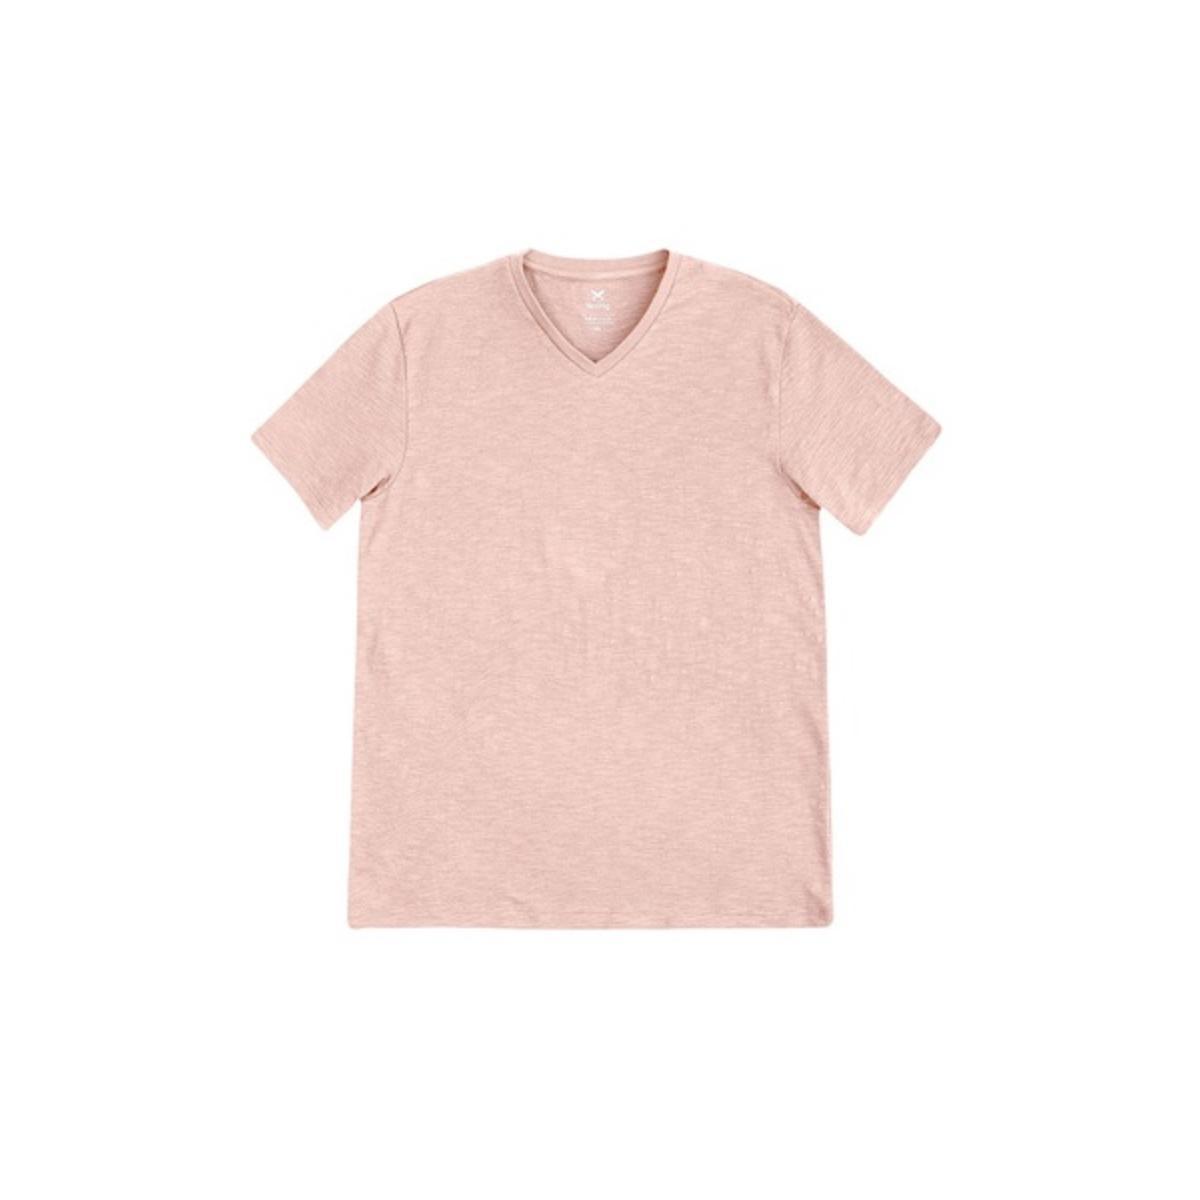 Camiseta Masculina Hering N2k5 Krren Rose